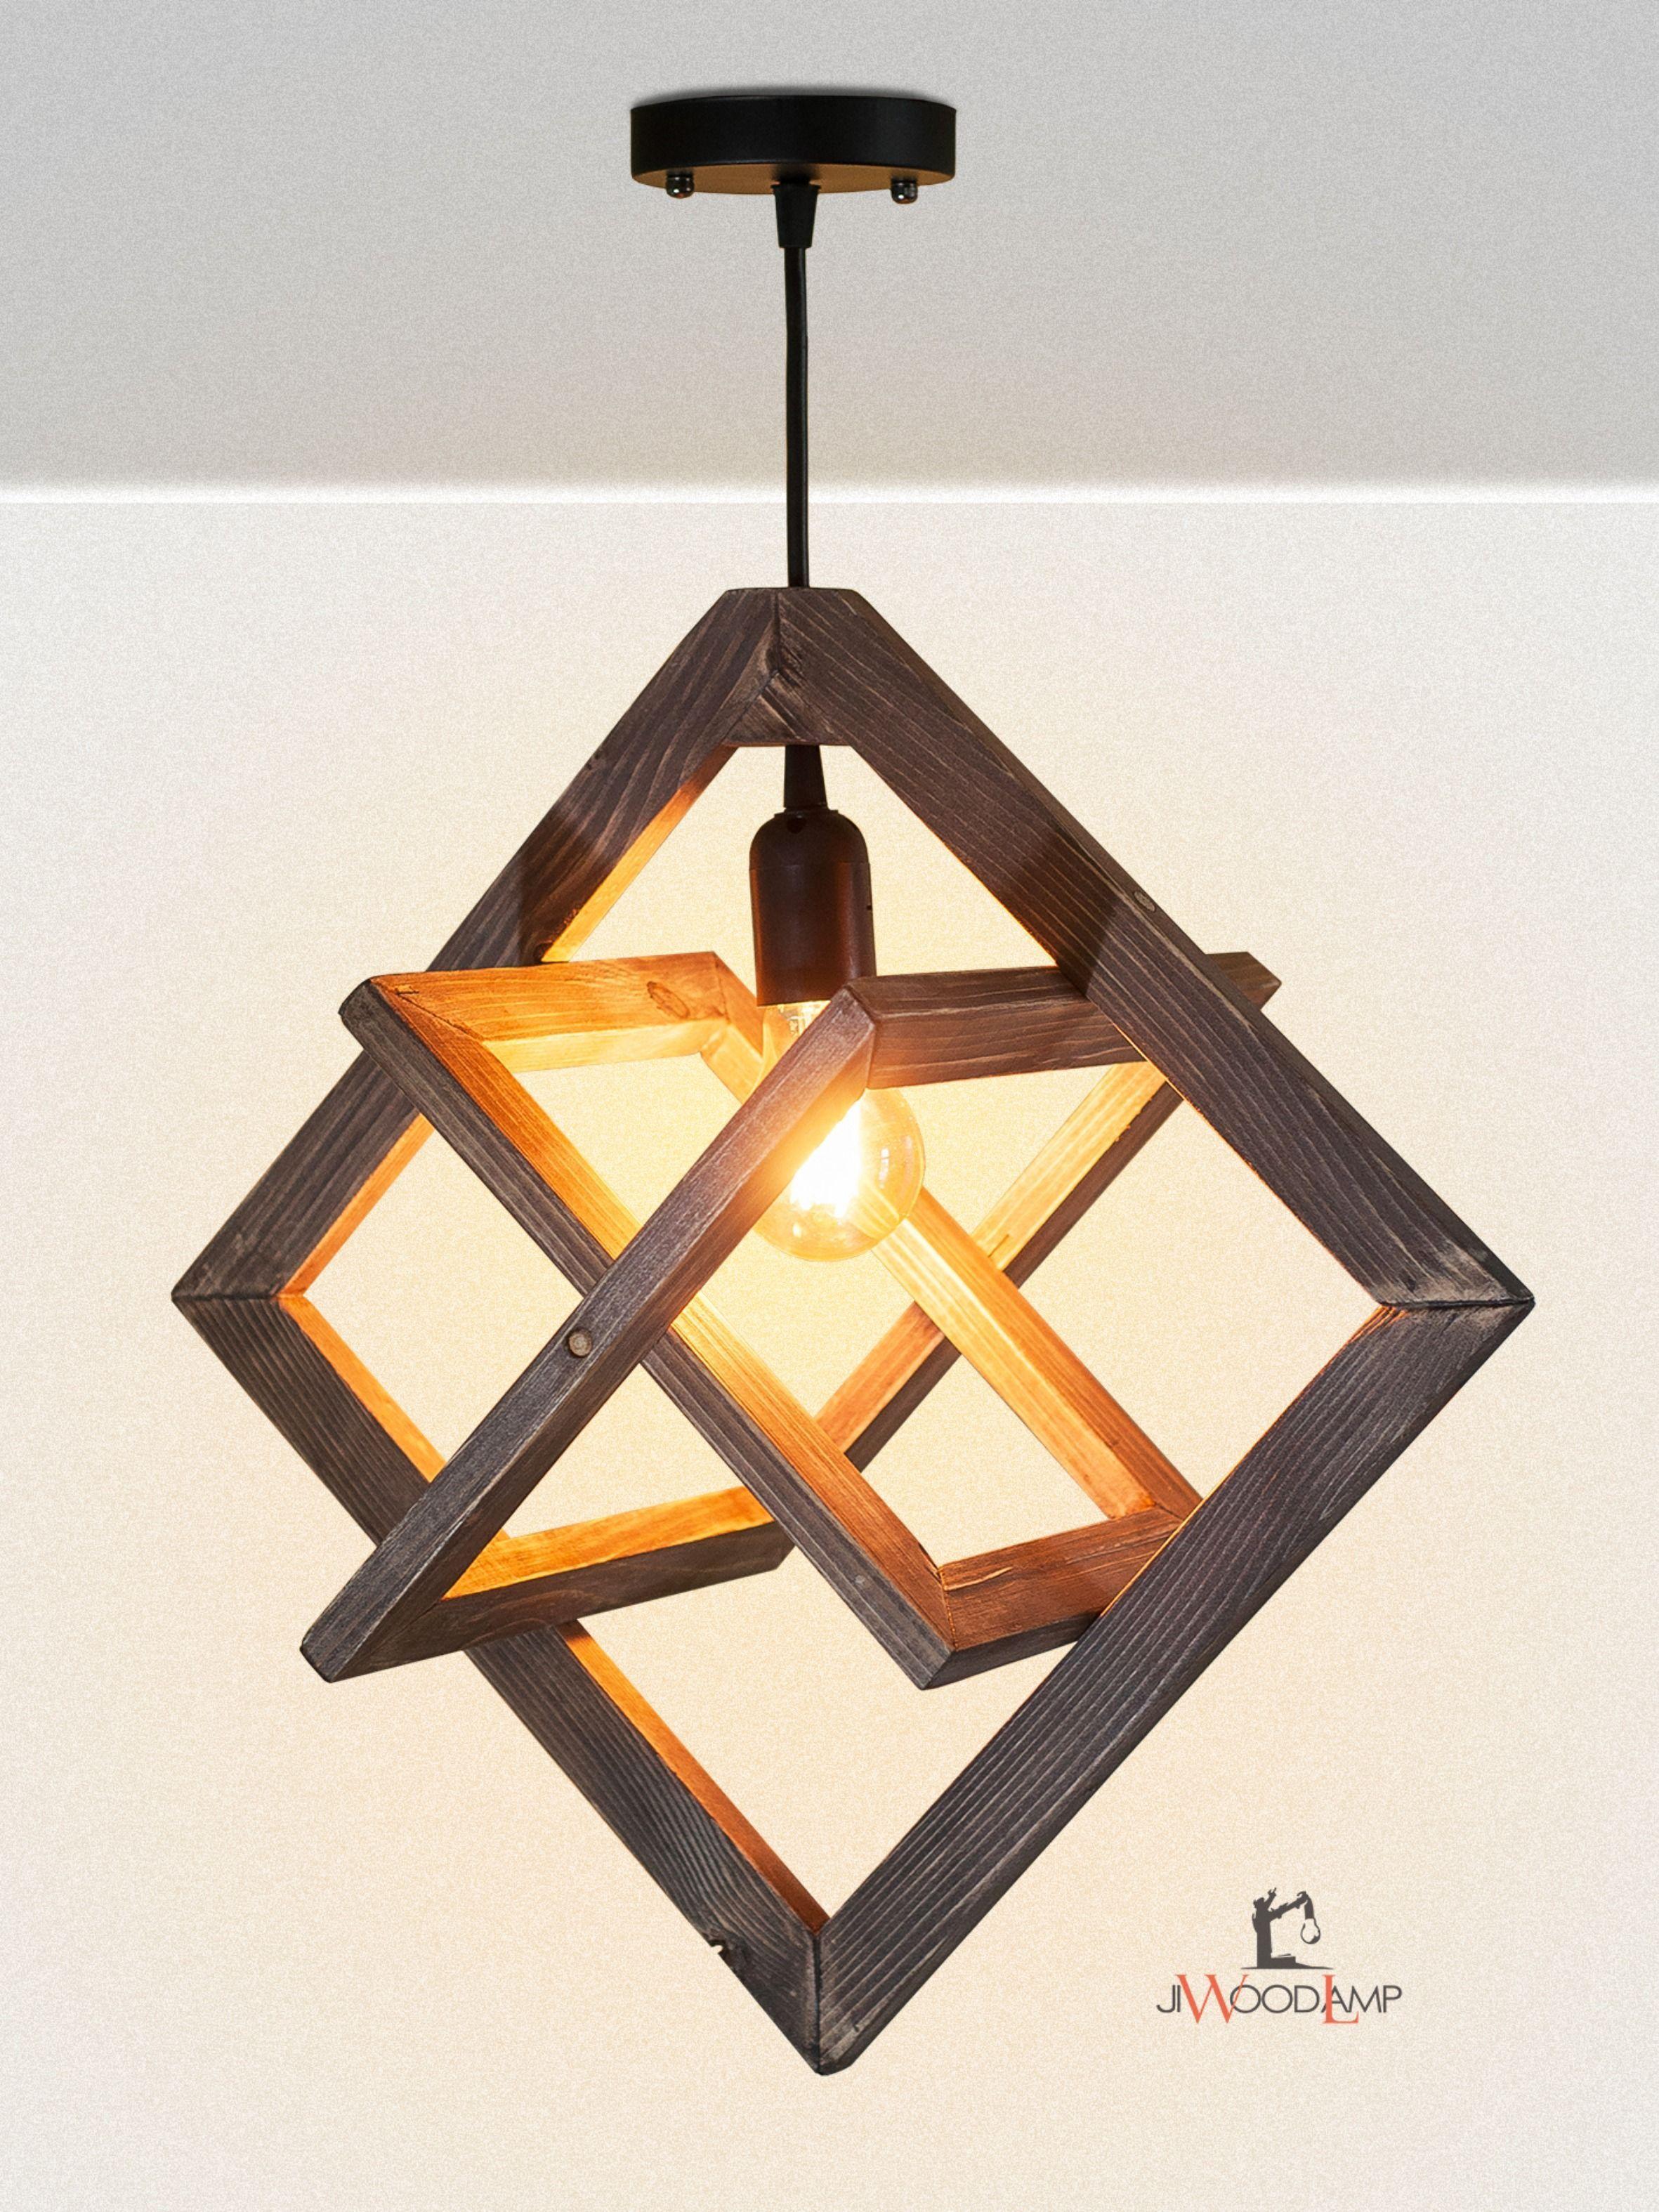 Wooden Hanging Lamp Wood Lamp Pendant Lighting Wooden Lamp